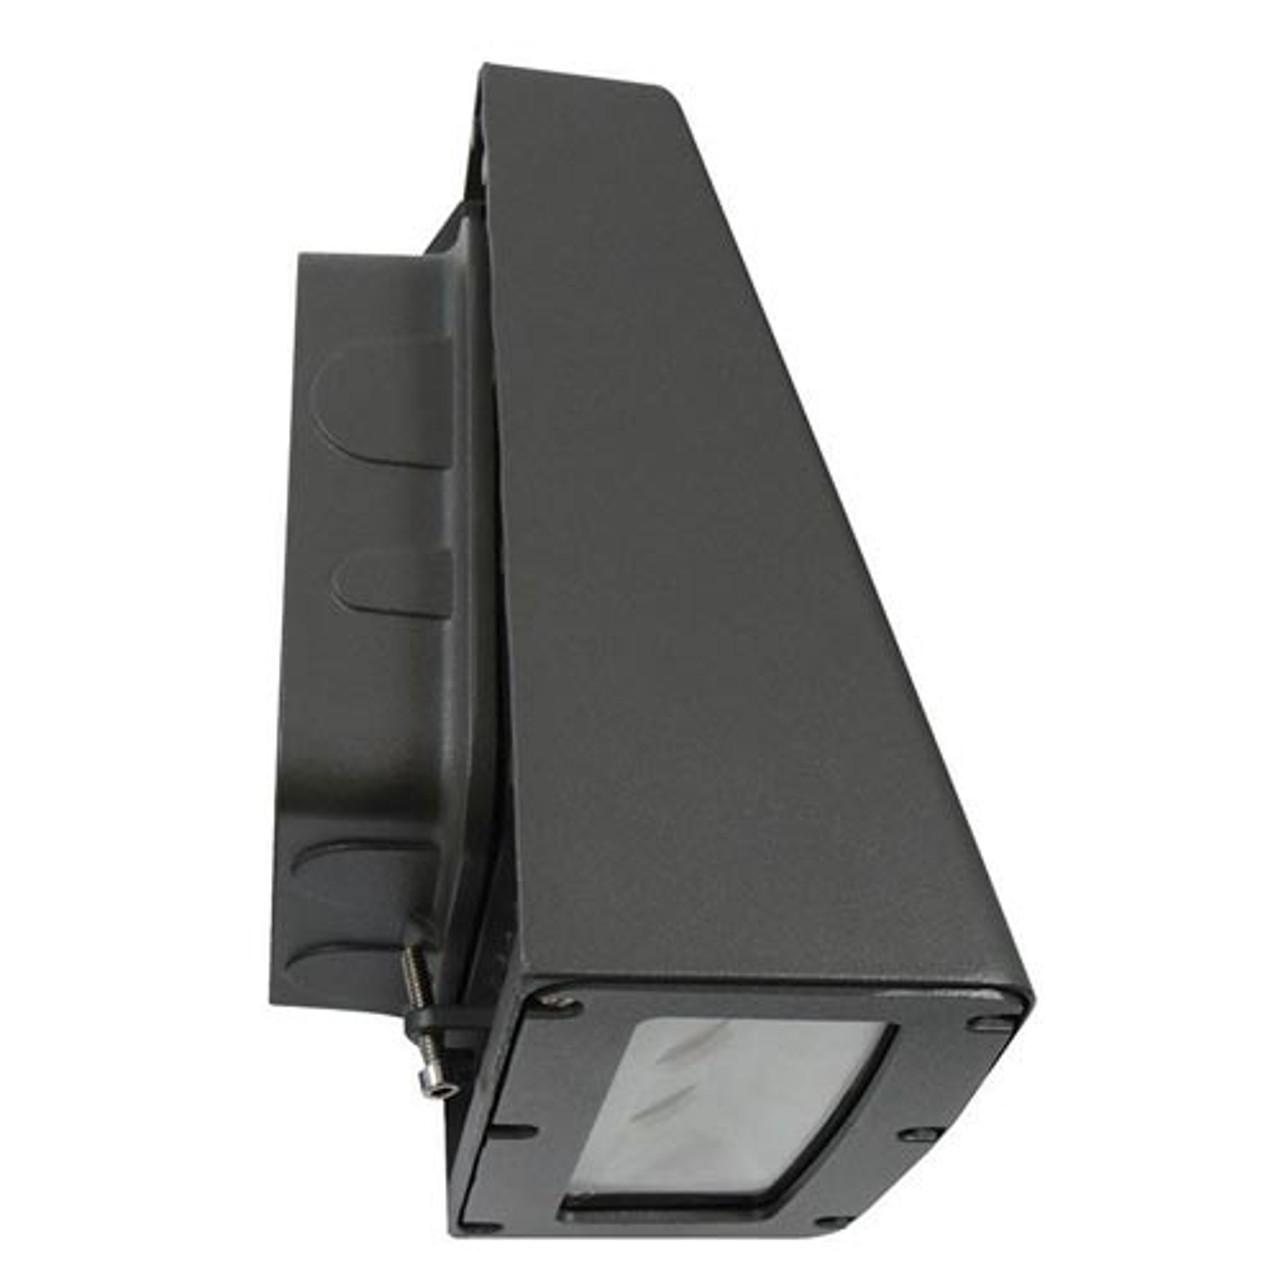 LED 60 Watt Wall Pack